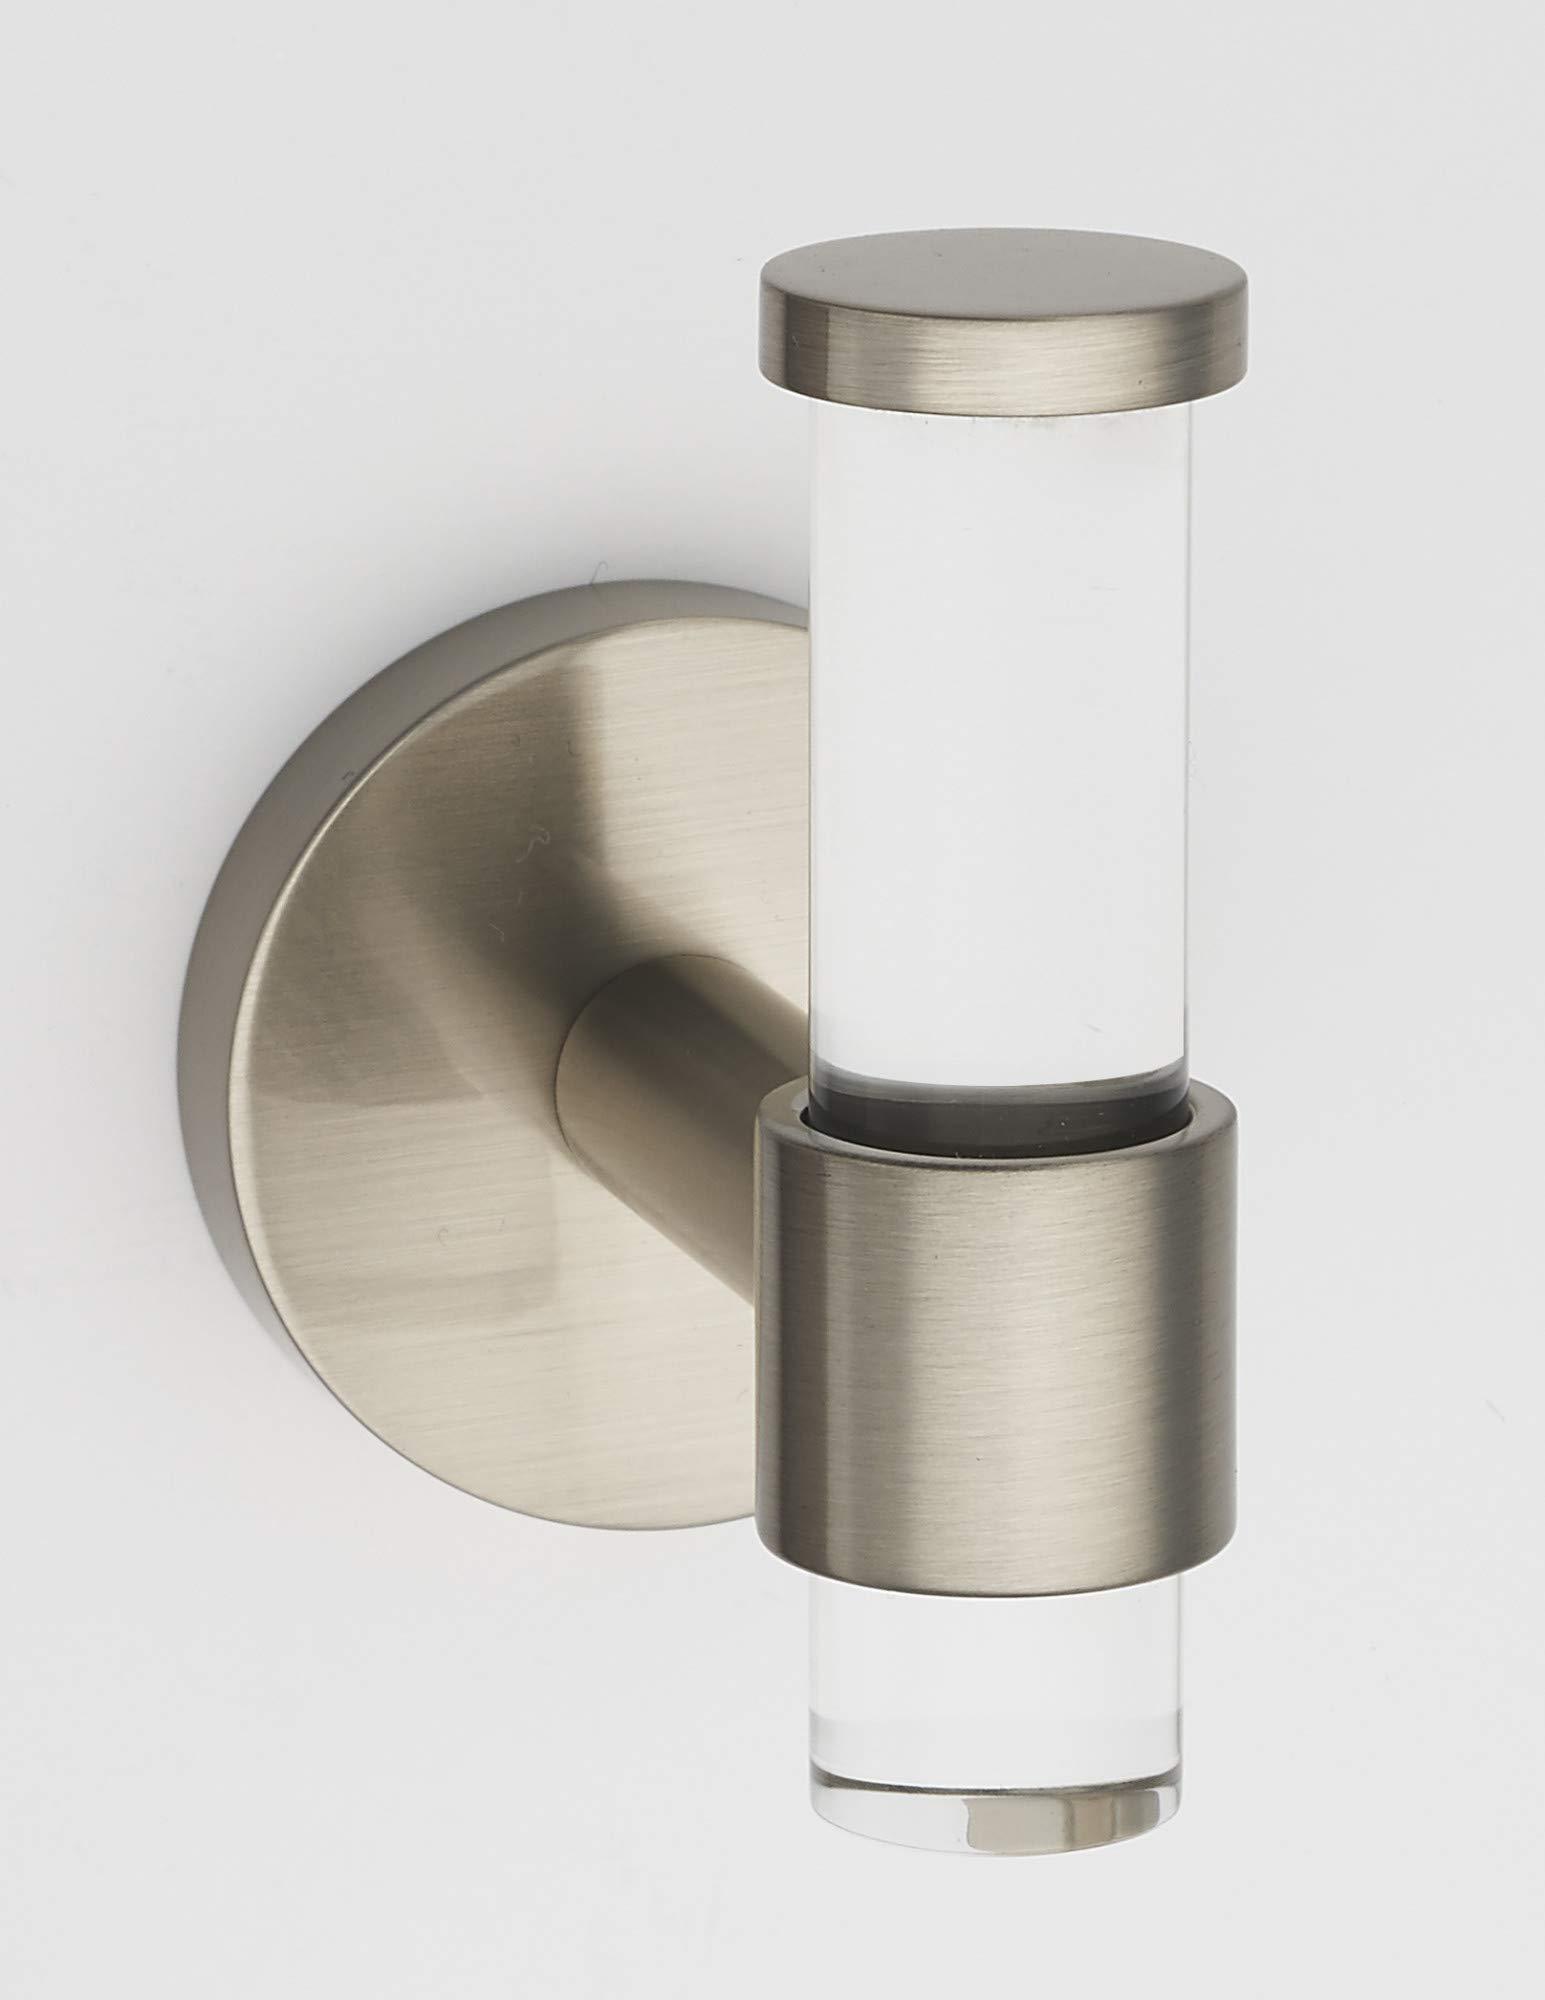 Alno A7281-SN Contemporary Acrylic 3-1/8 Inch Tall Single Prong Robe Hook